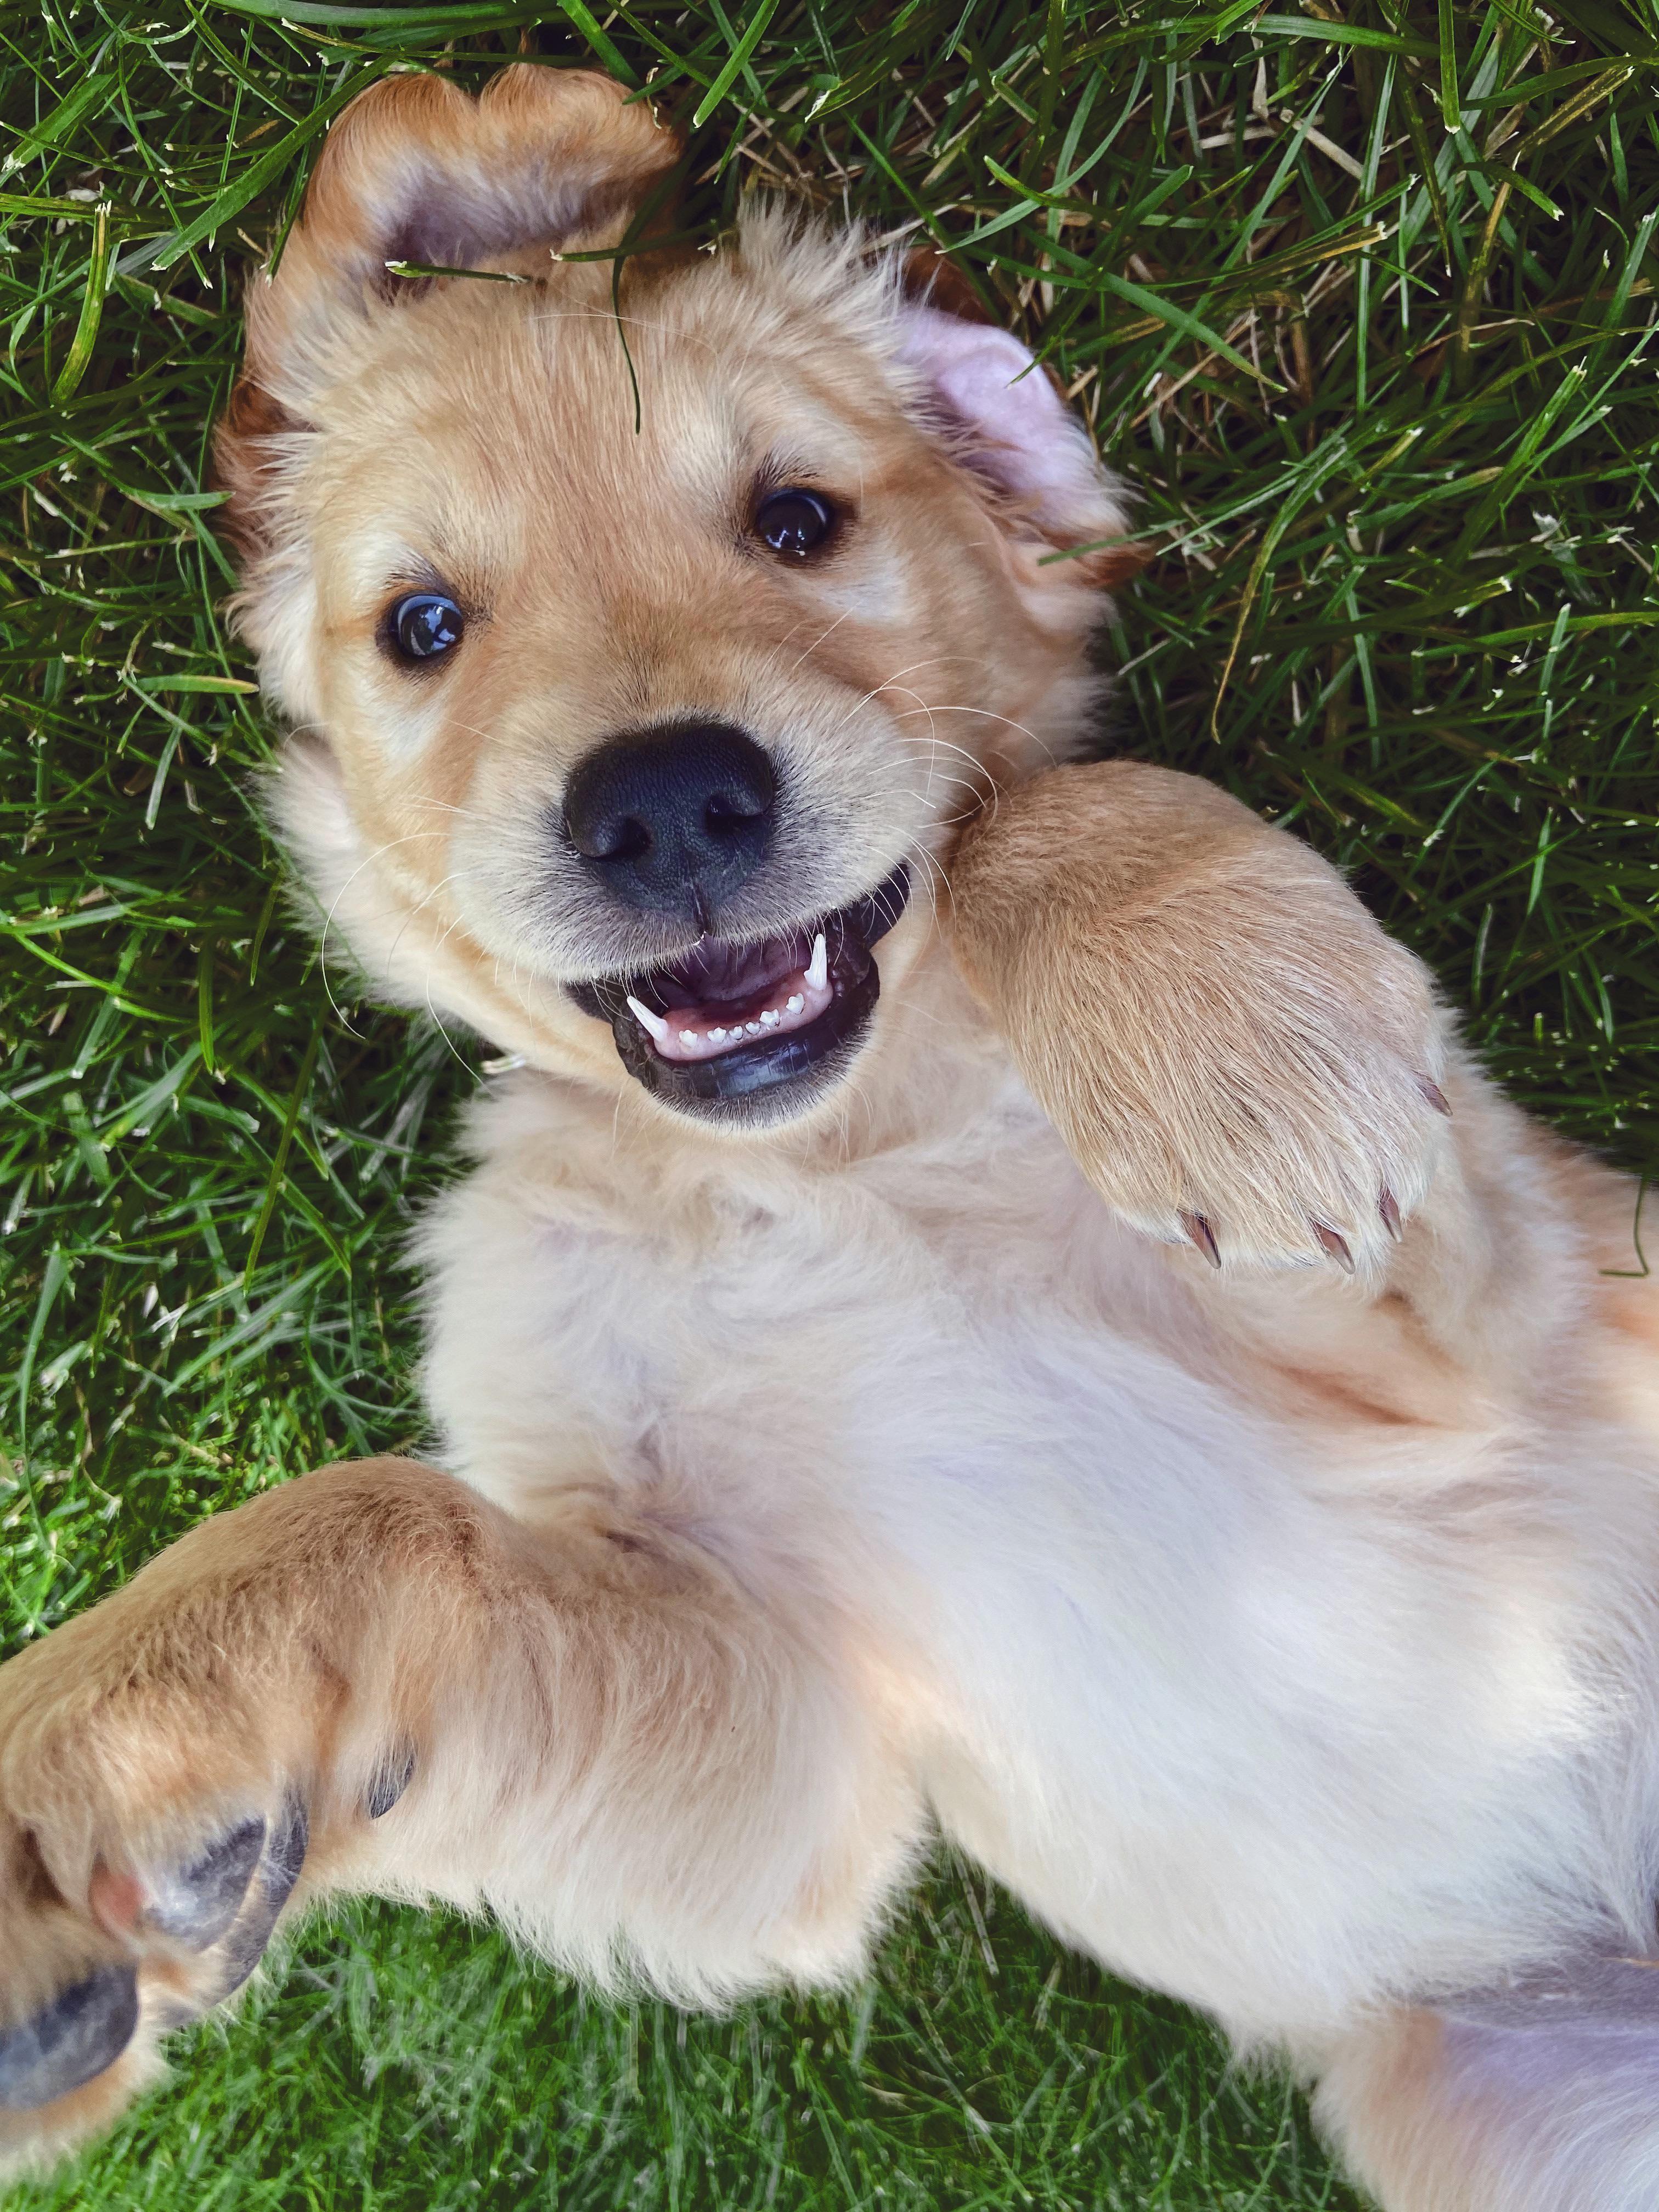 Puppy Smiles Super Cute Goldenretriever 3 In 2020 Golden Retriever Husky Mix Full Grown Golden Retriever Training Dogs Golden Retriever